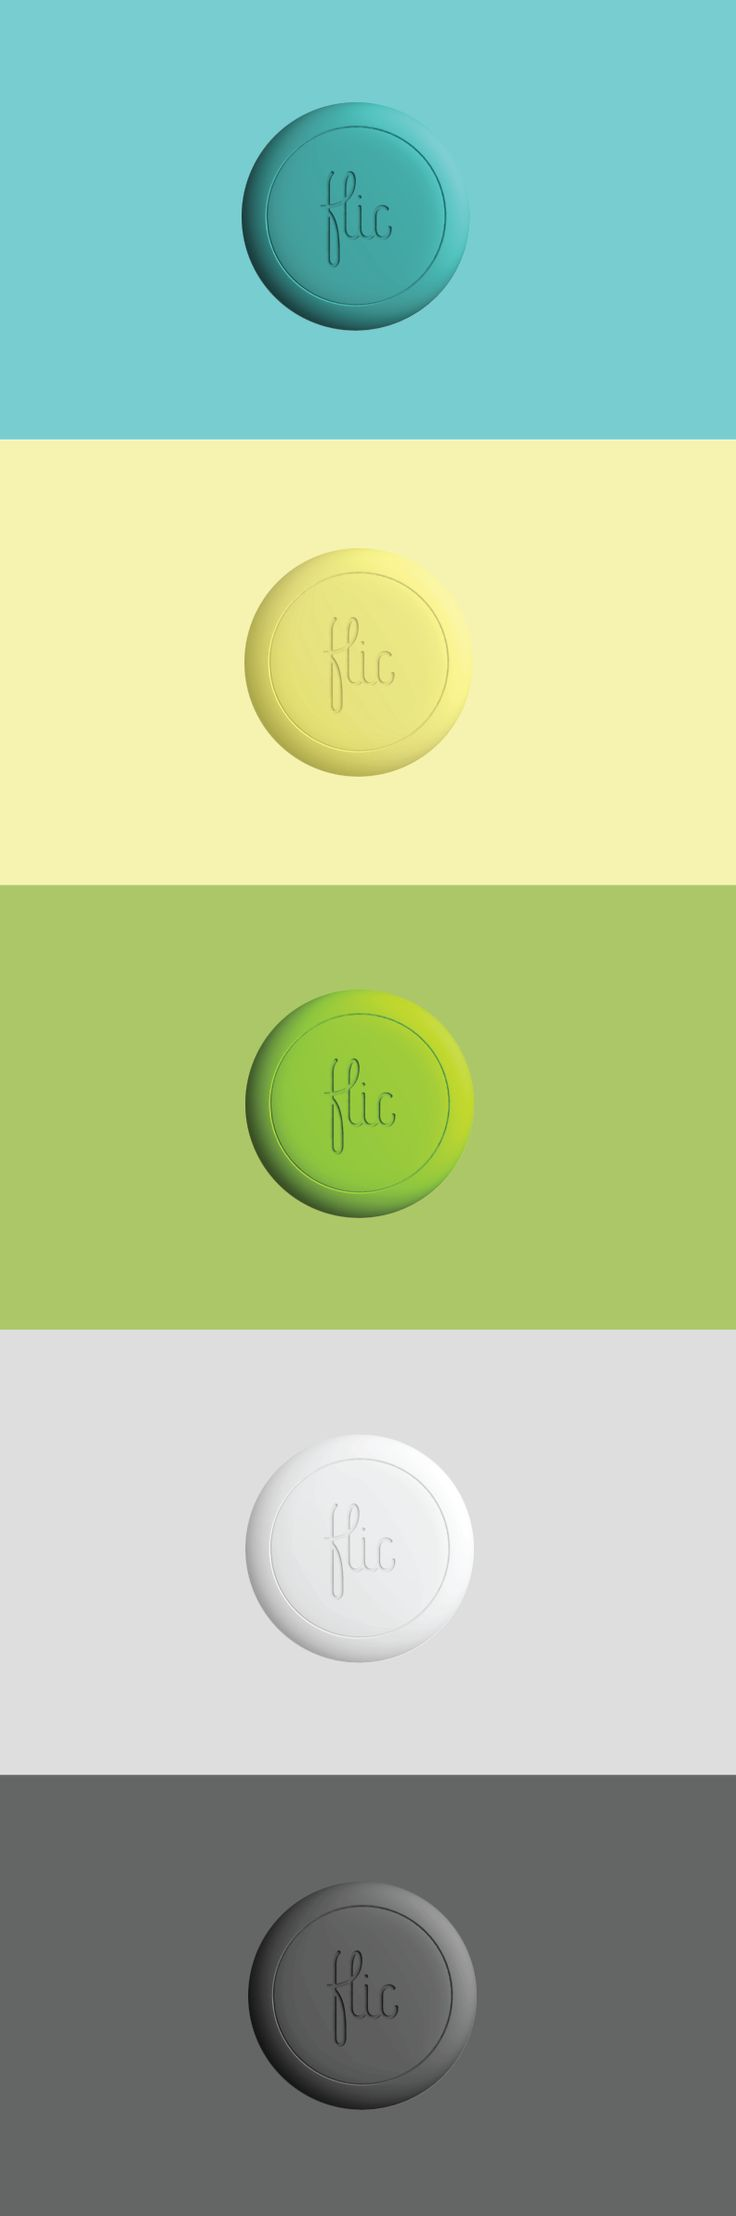 The colors of Flic. https://flic.io